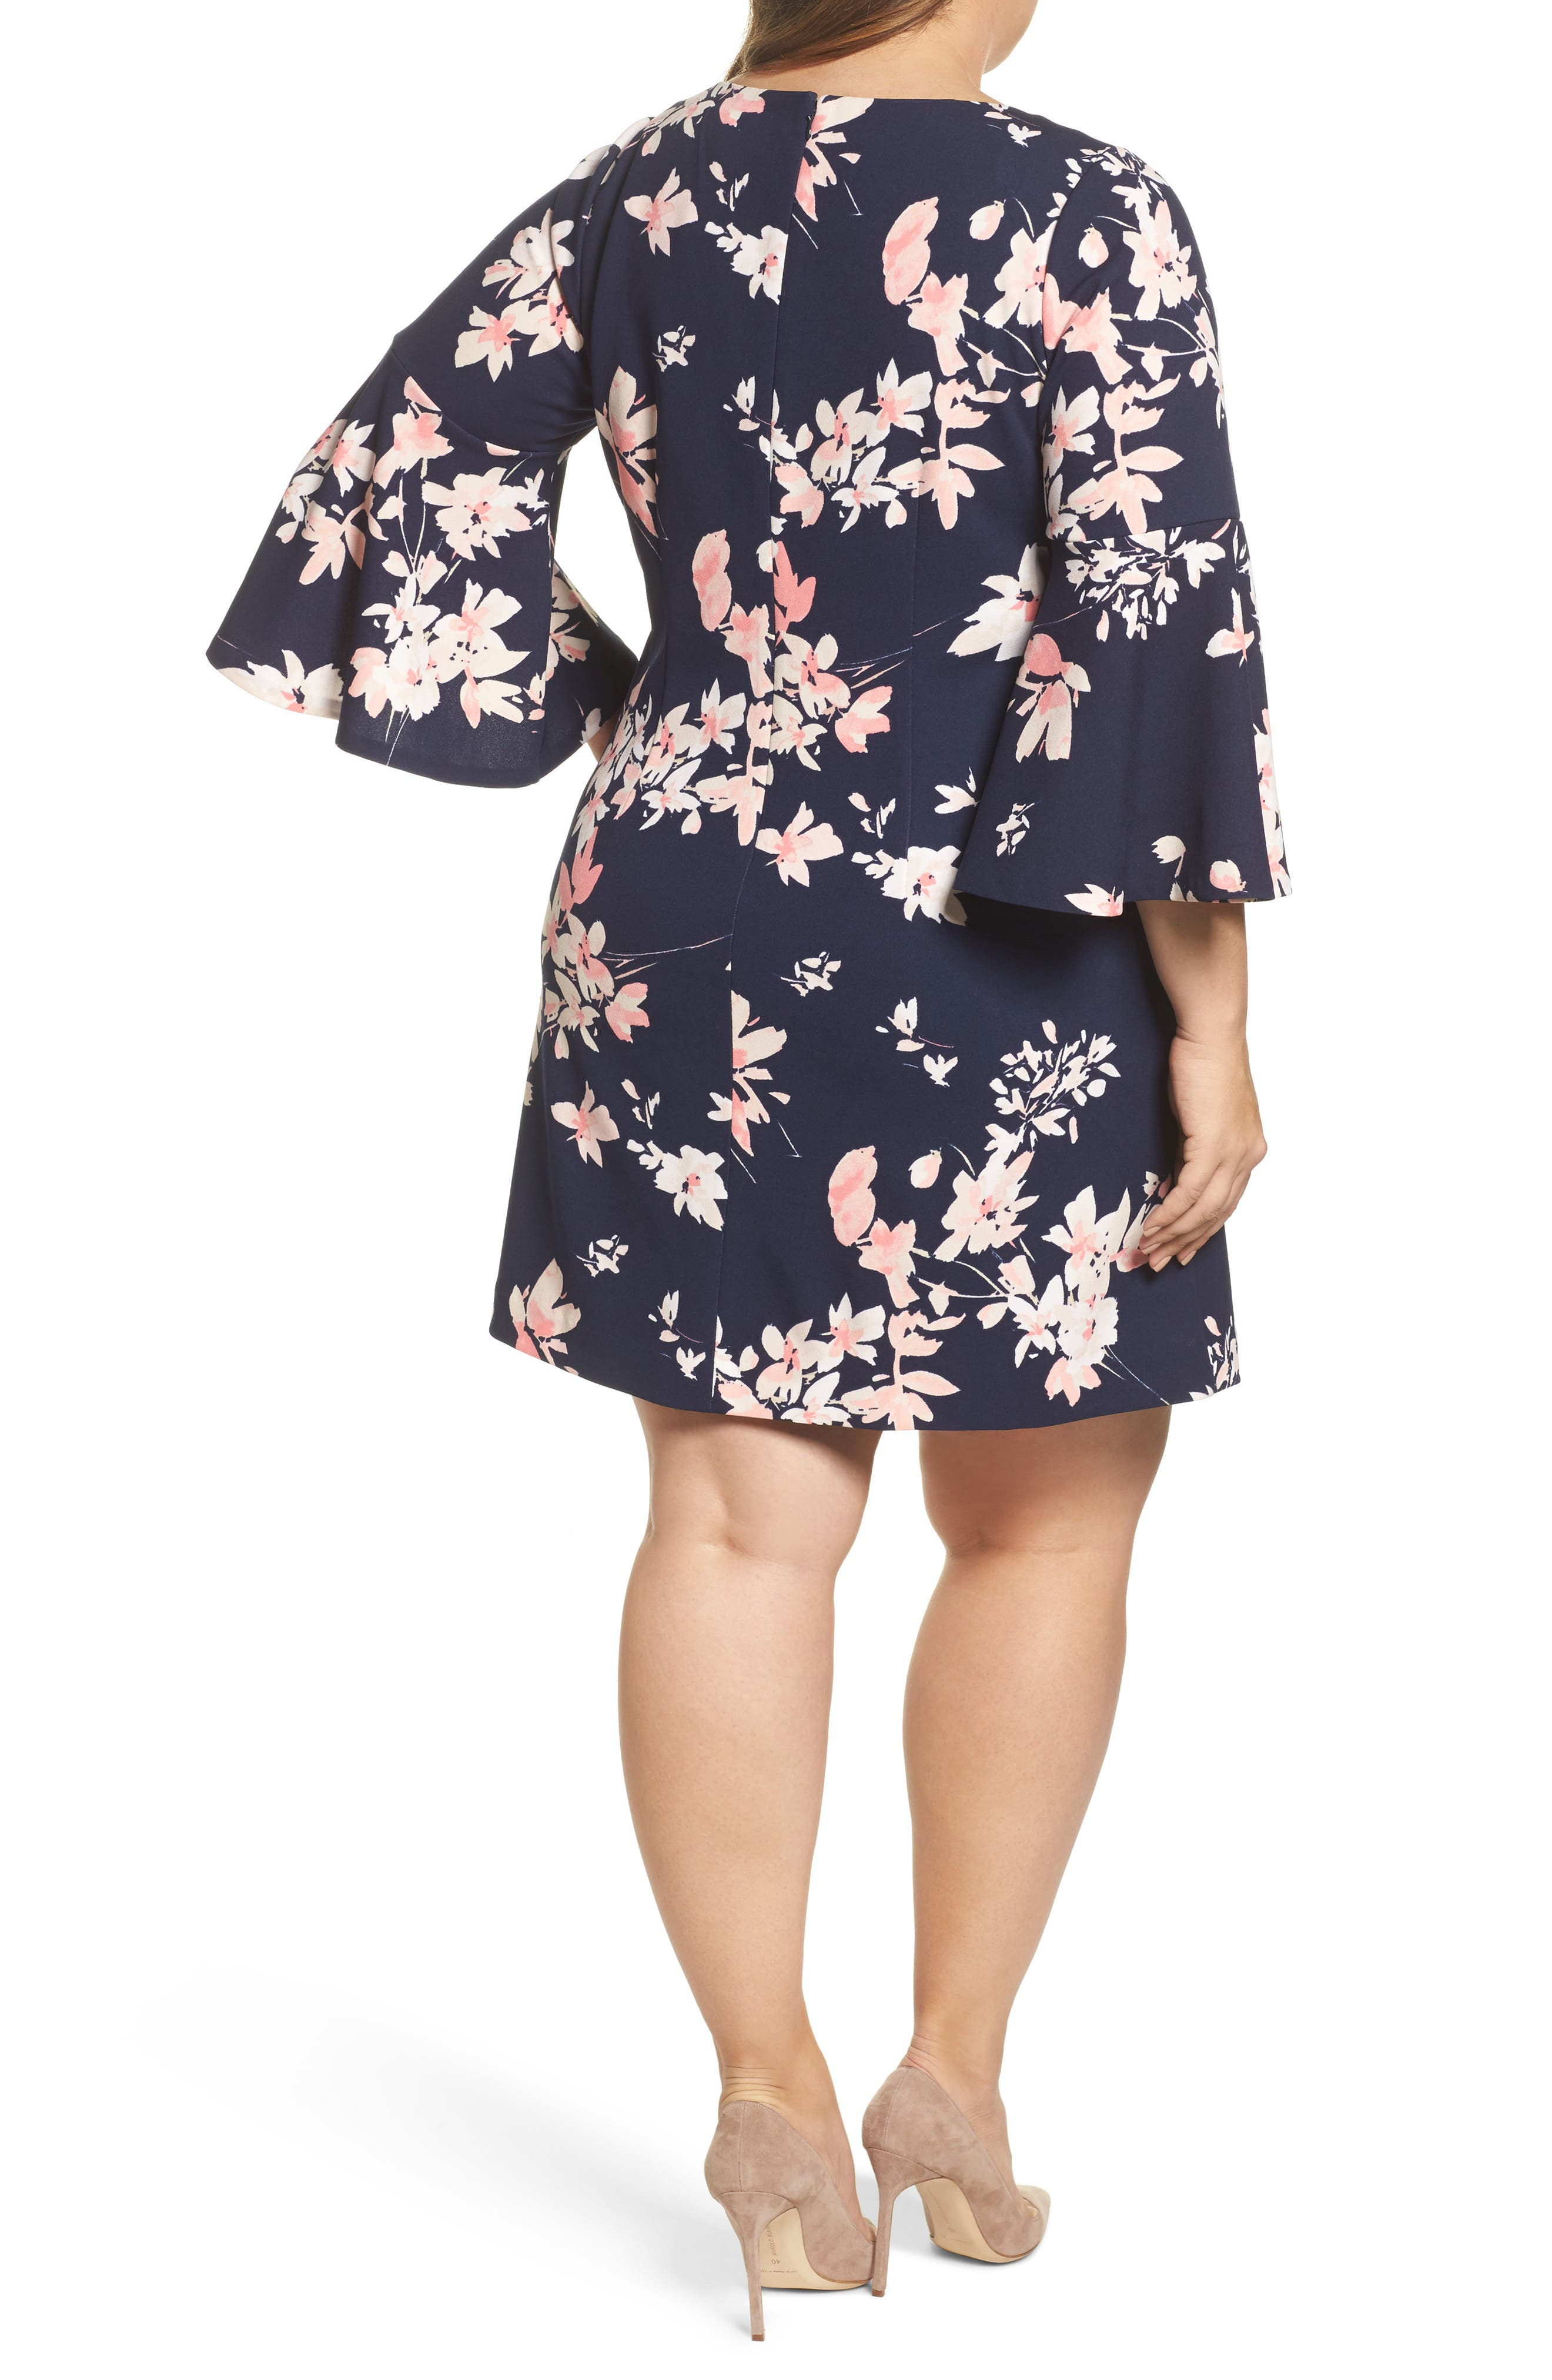 ELIZA J, Floral Print Bell Sleeve Shift Dress, Alternate thumbnail 2, color, NAVY/ PINK